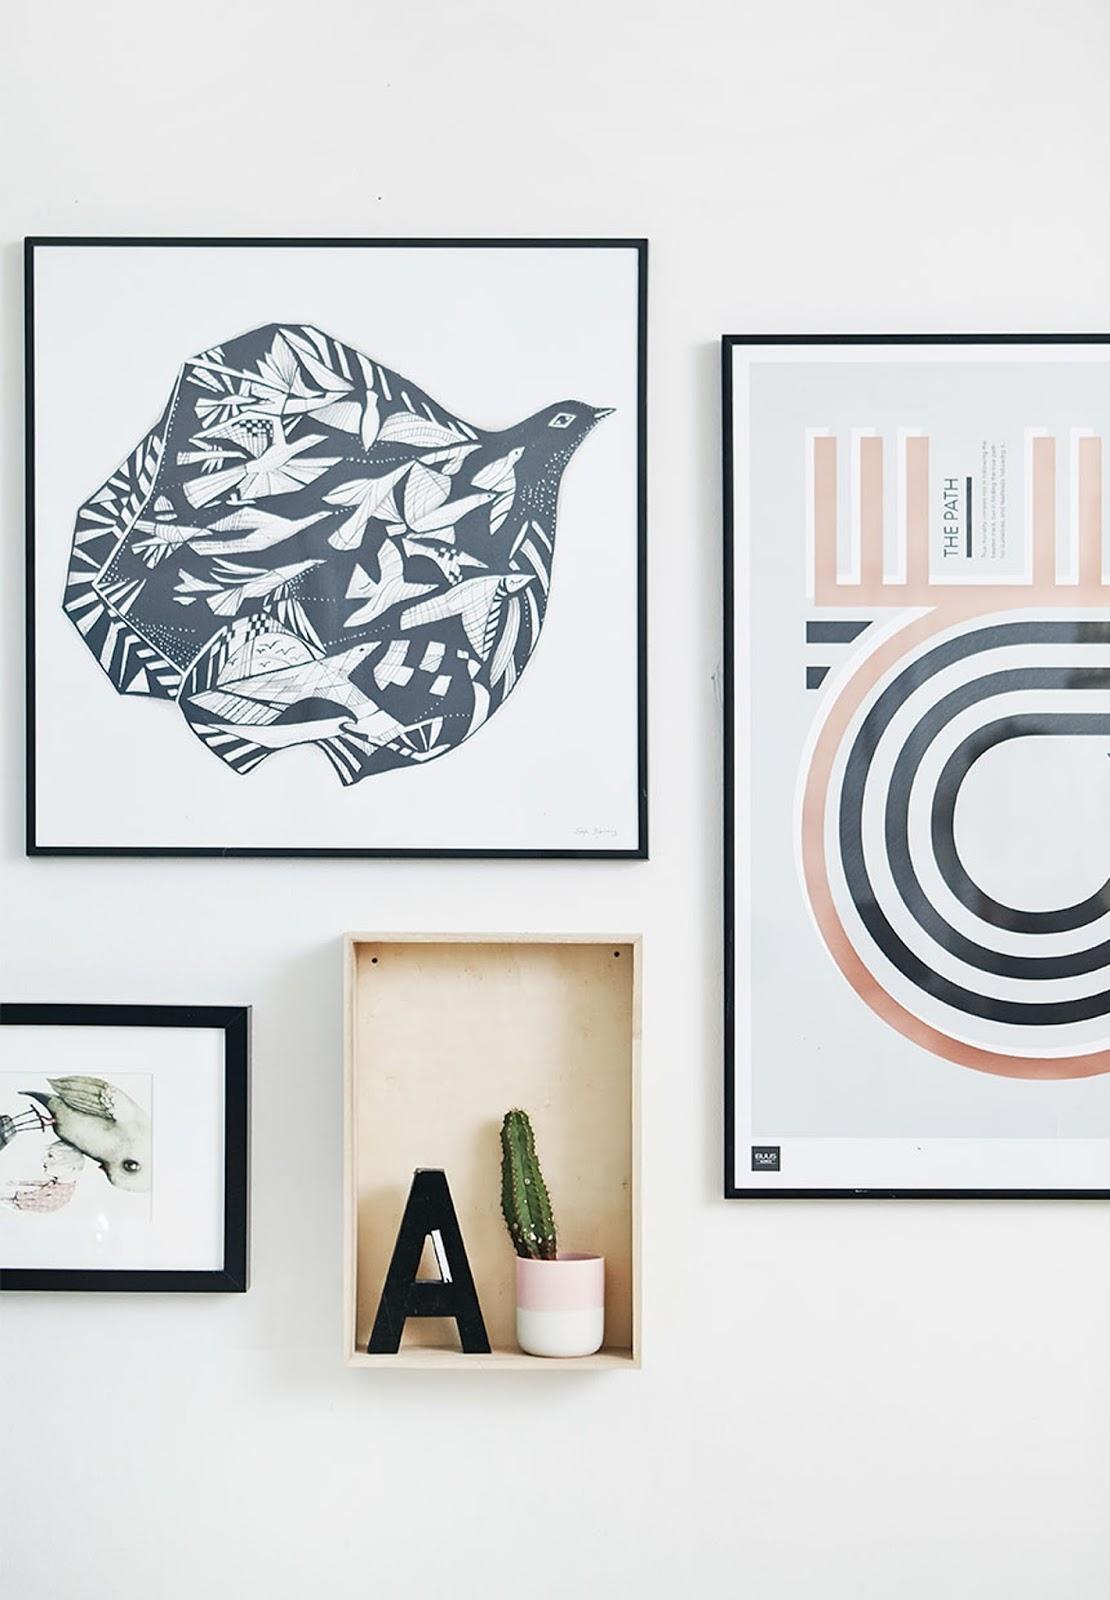 wall decor, modern illustration, cactus, art print